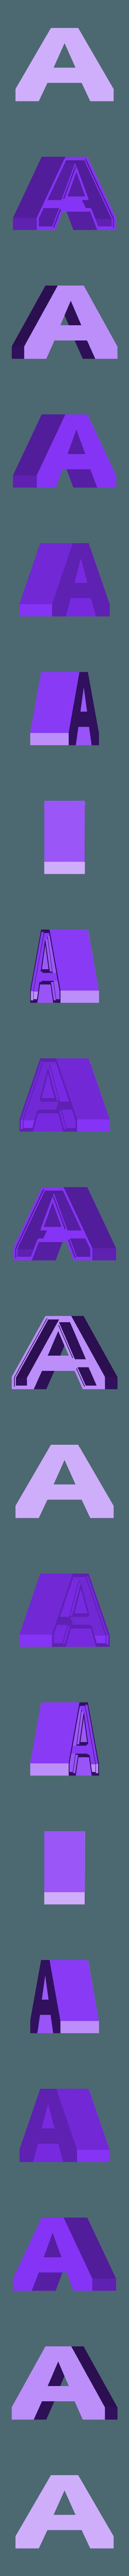 LETRA A.stl Download free STL file LUMINOUS LED NAME - SEA • 3D printable design, cristotier